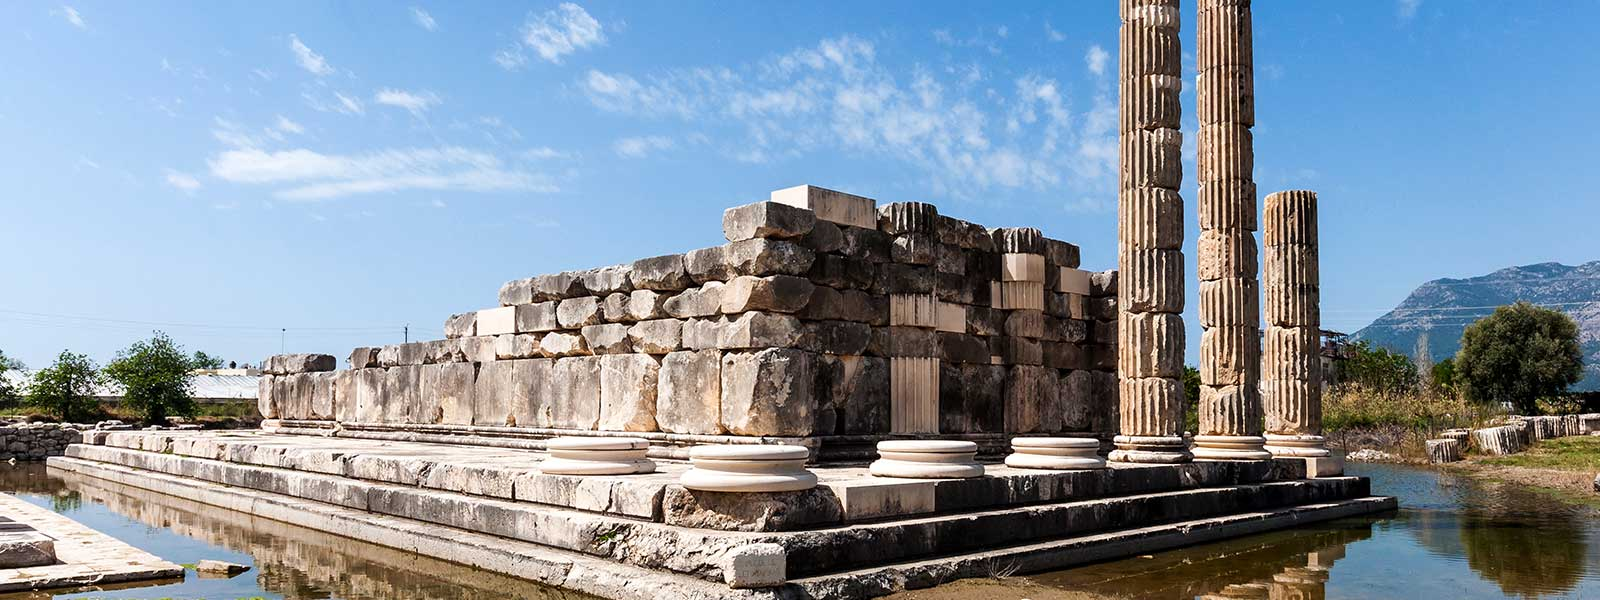 Letoon Ancient City Turkey